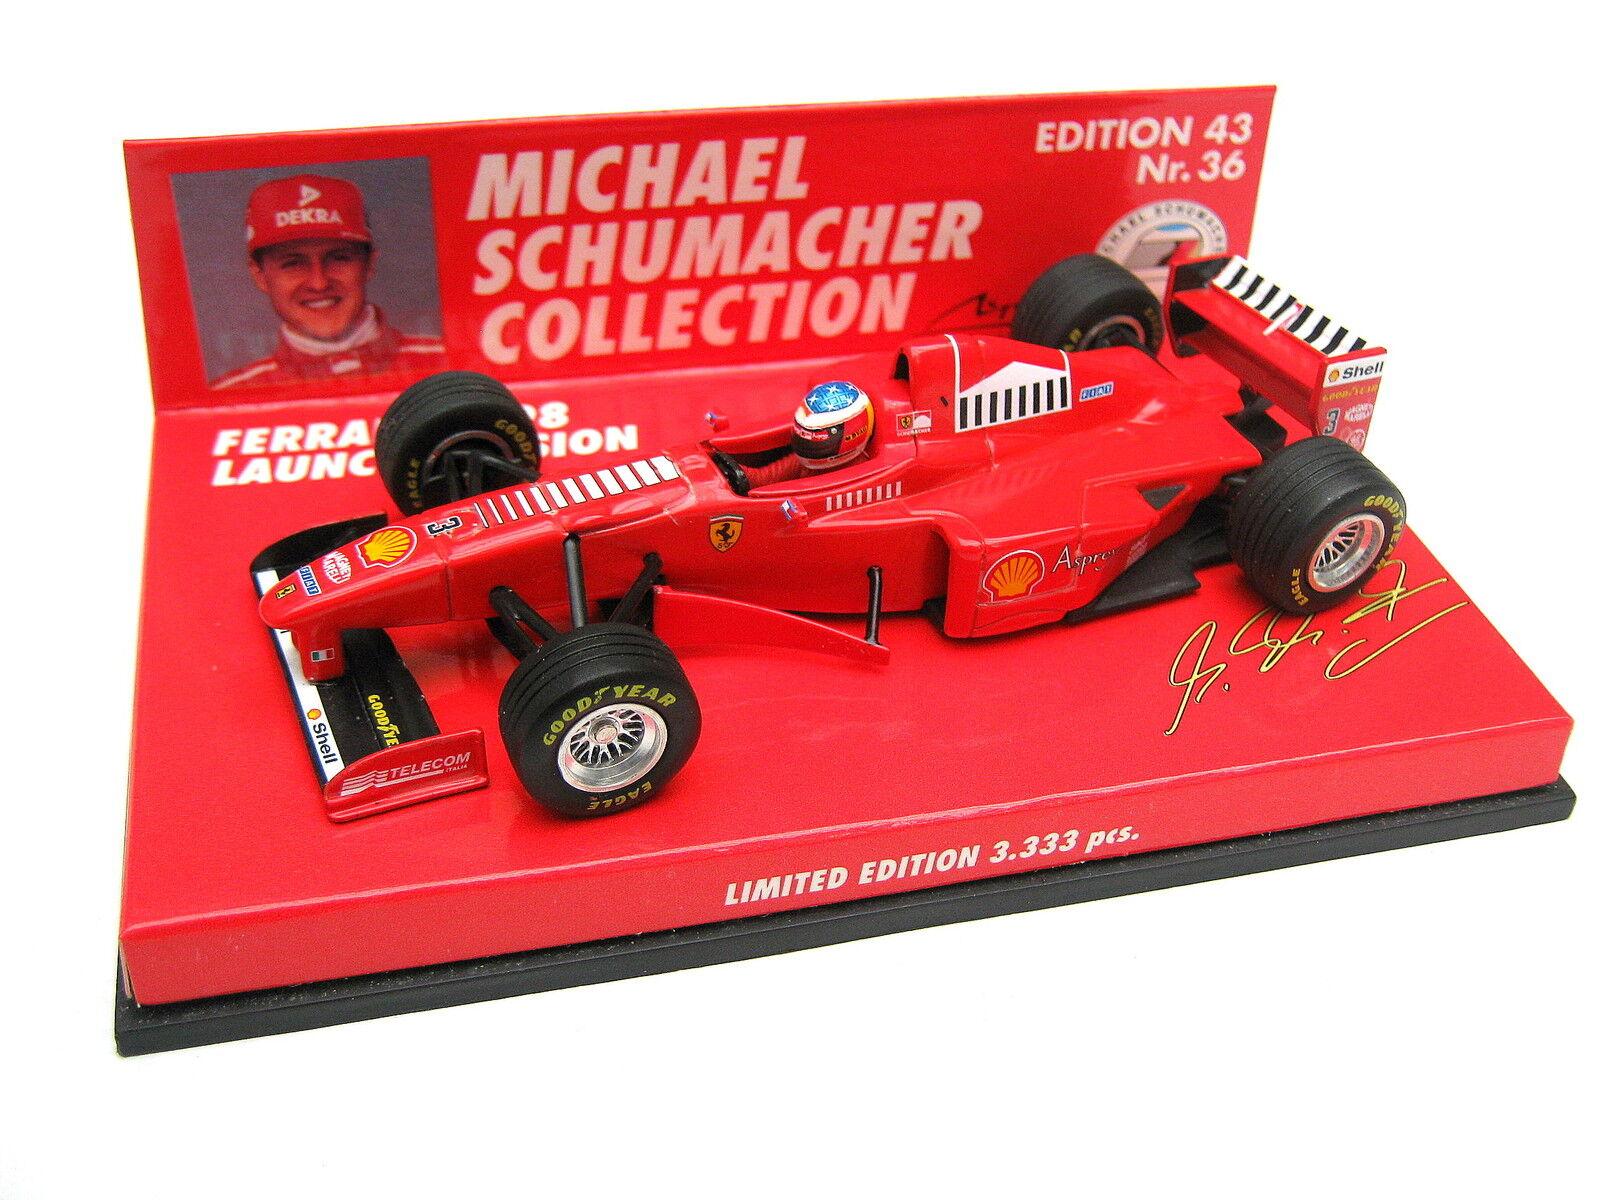 FERRARI f310b f300 Schumacher Launch Version 1998 ed 43 no 36 510984393 1/43 OVP